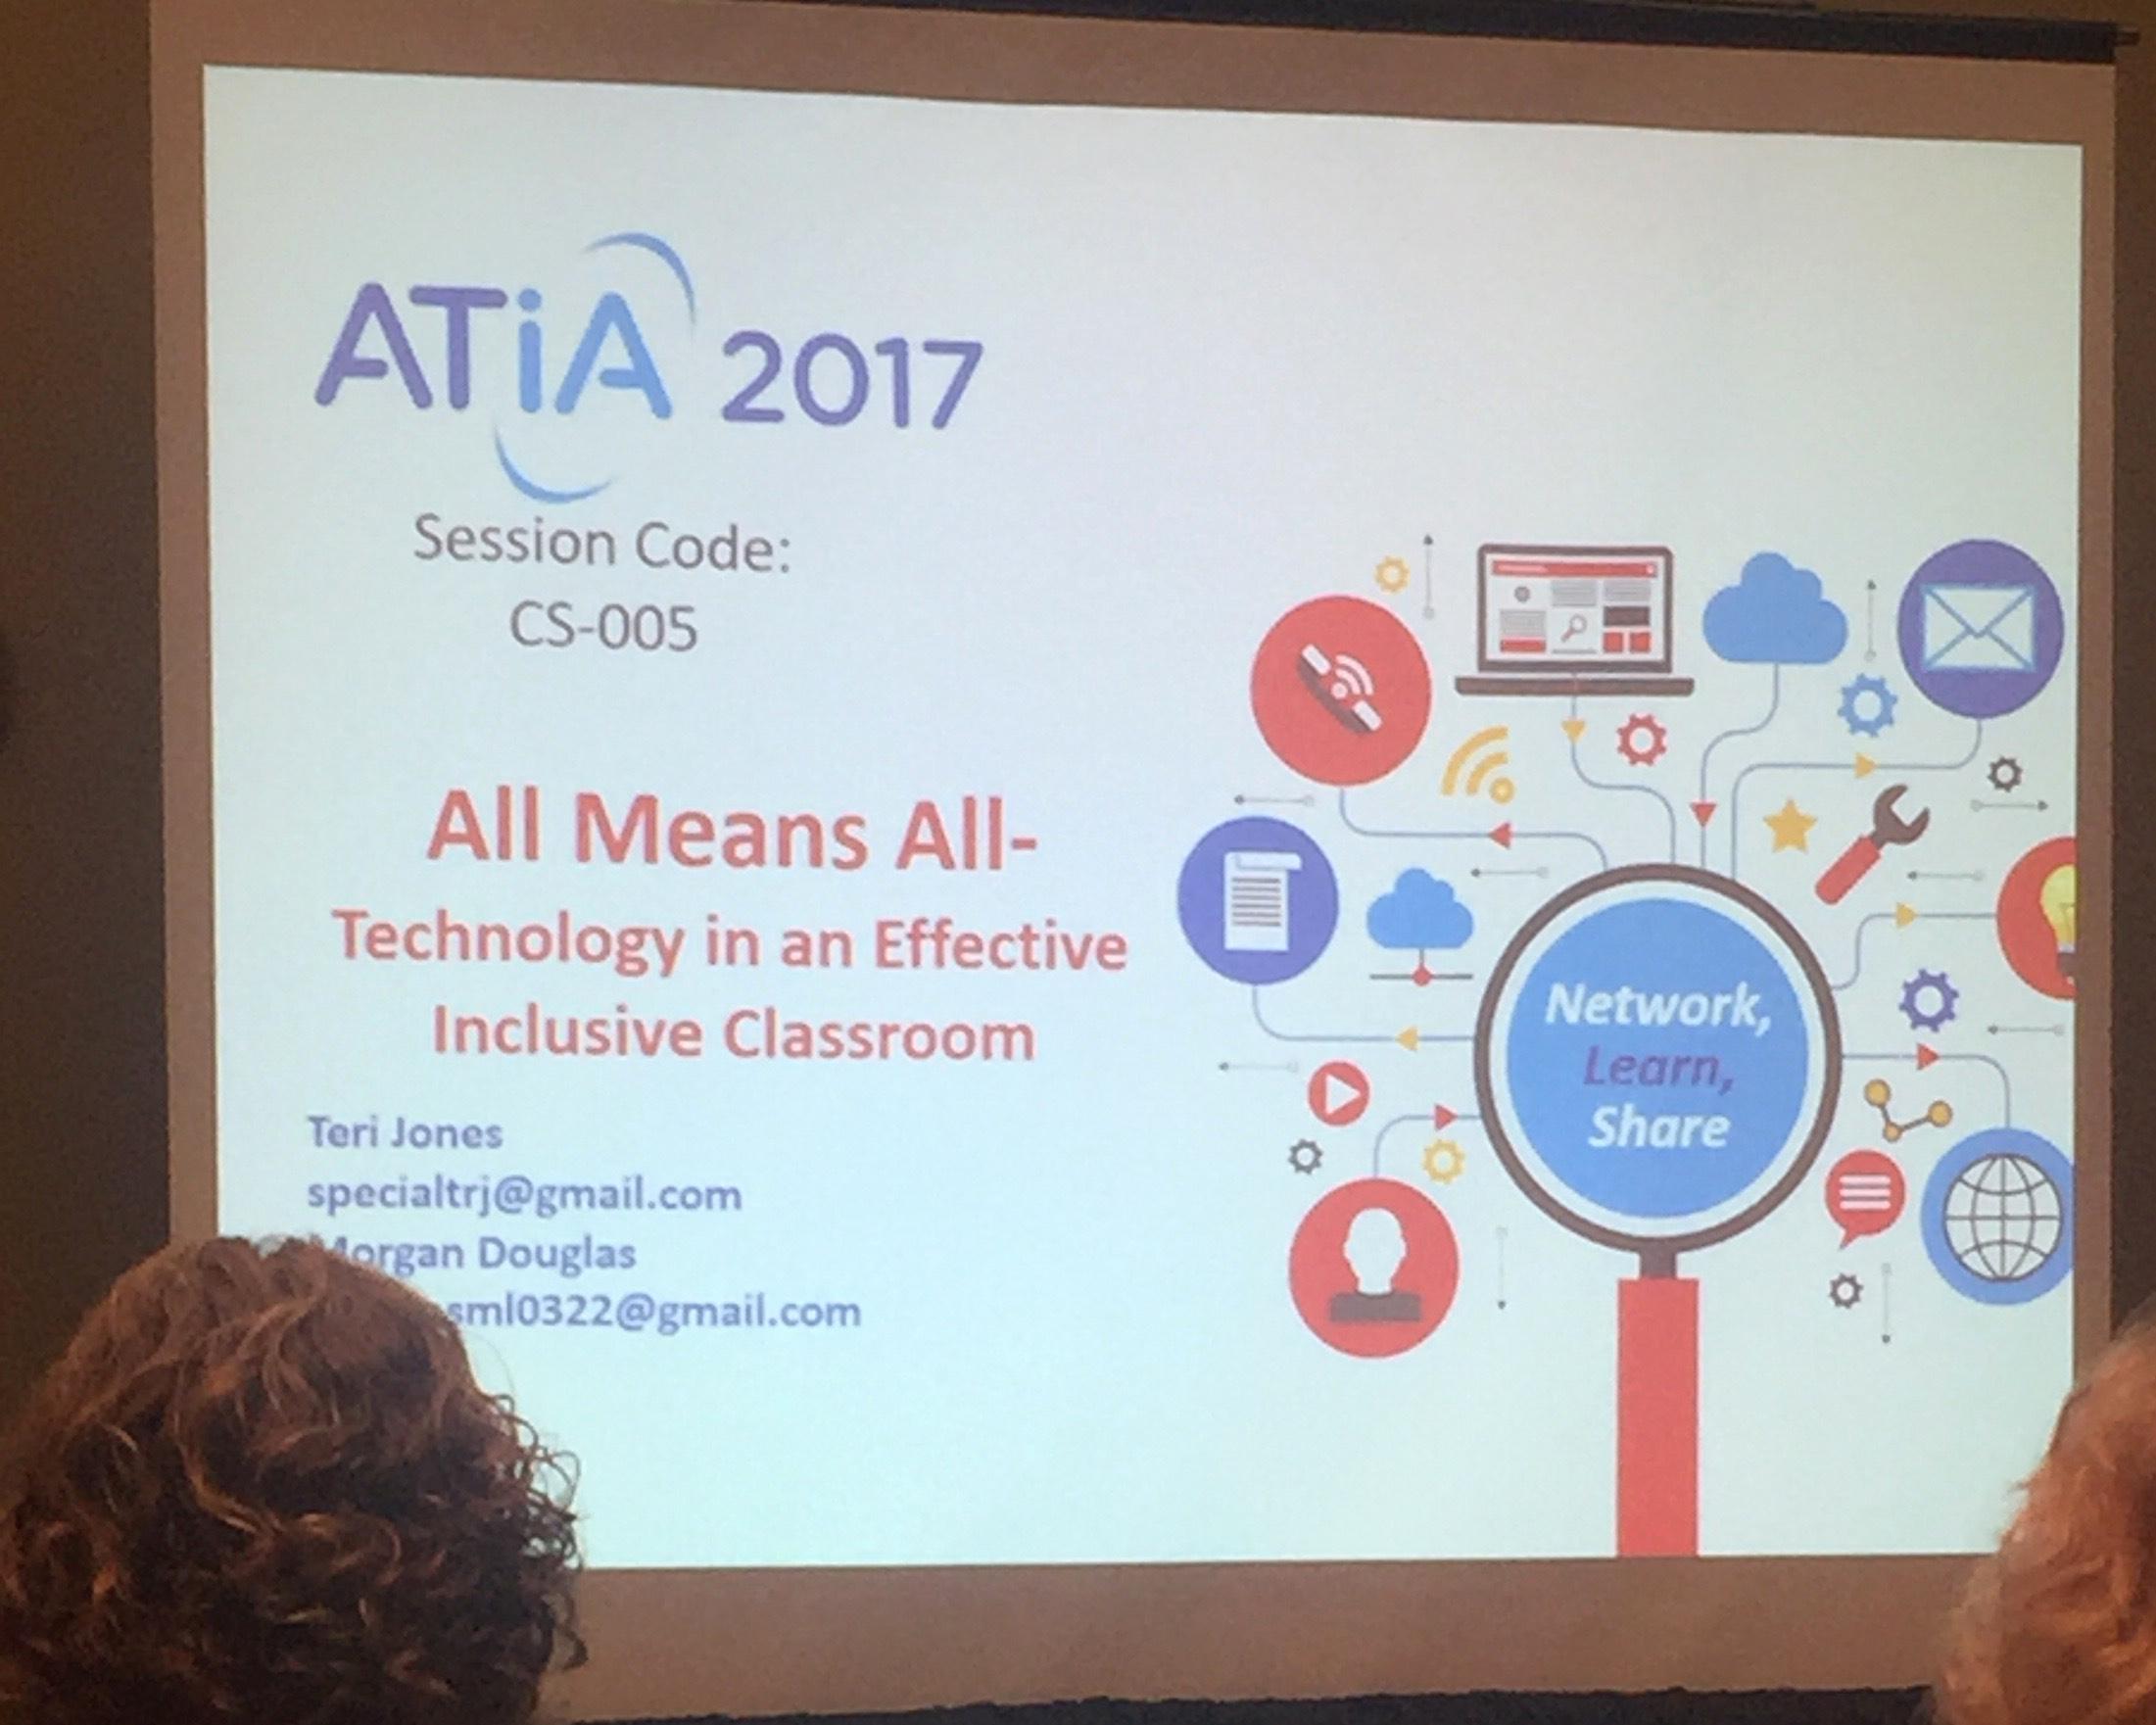 ATIA 2017 Demonstration